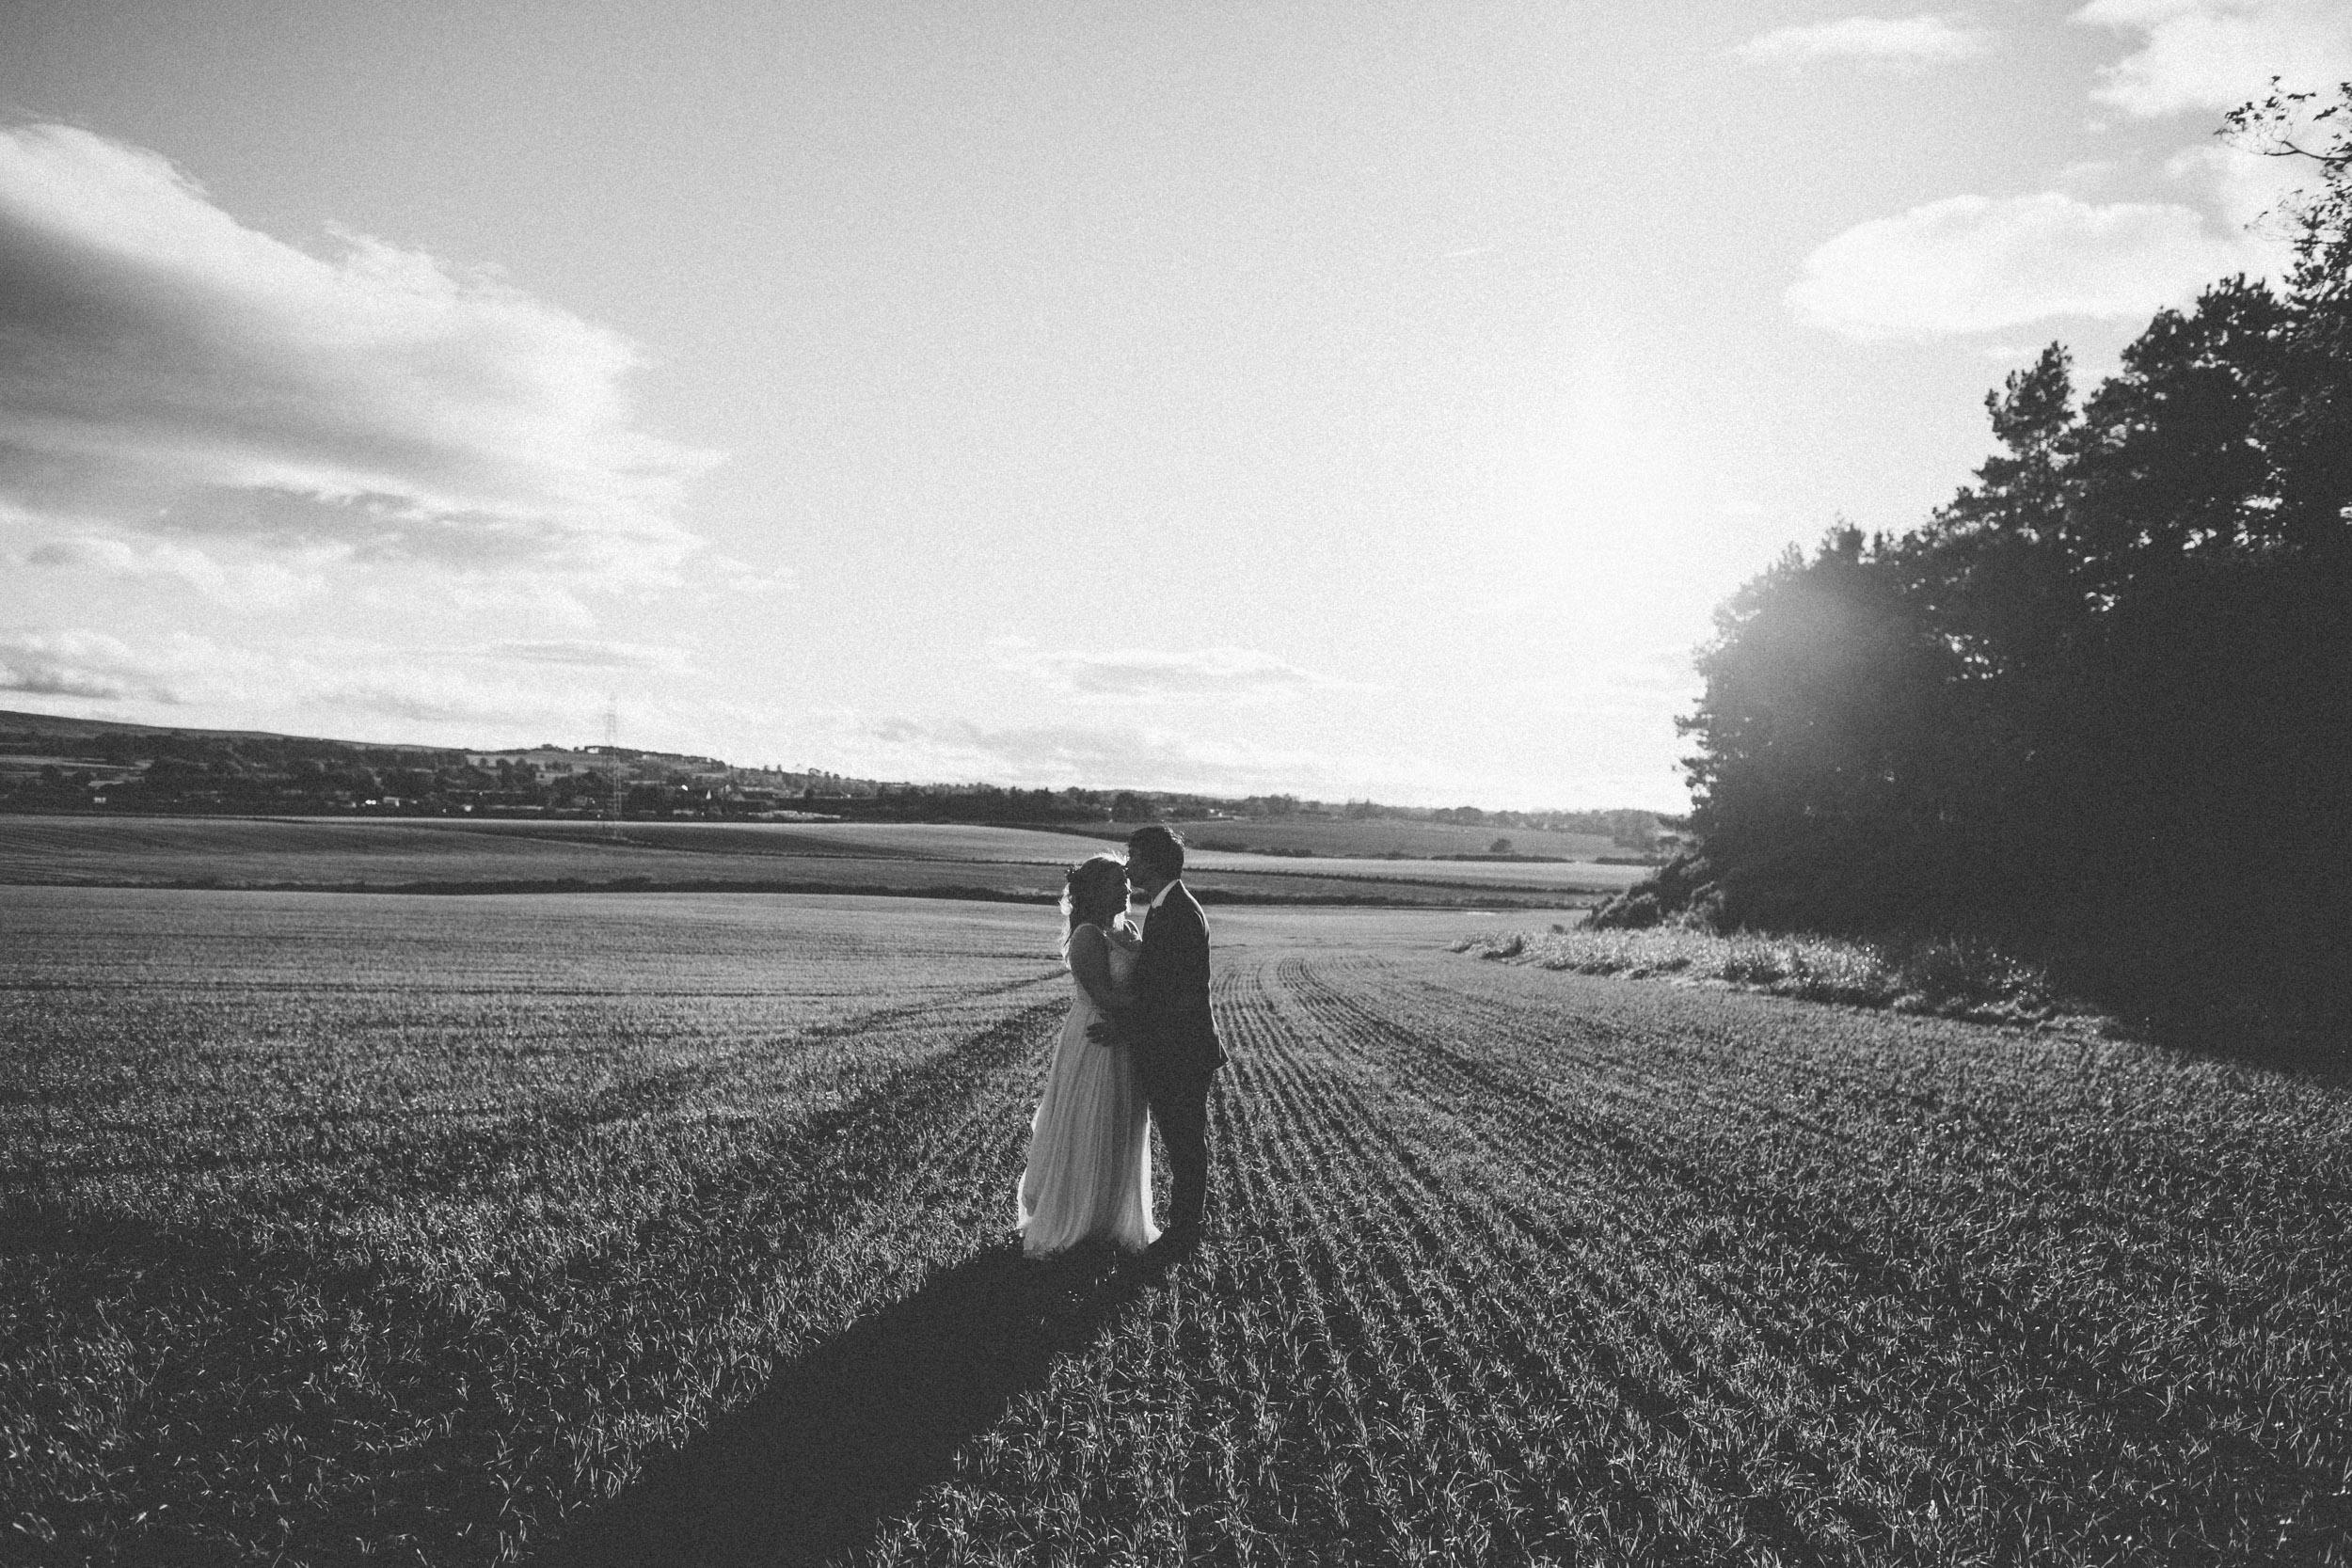 Quirky Wedding Photographer Edinburgh Jupiter Artland -46.jpg